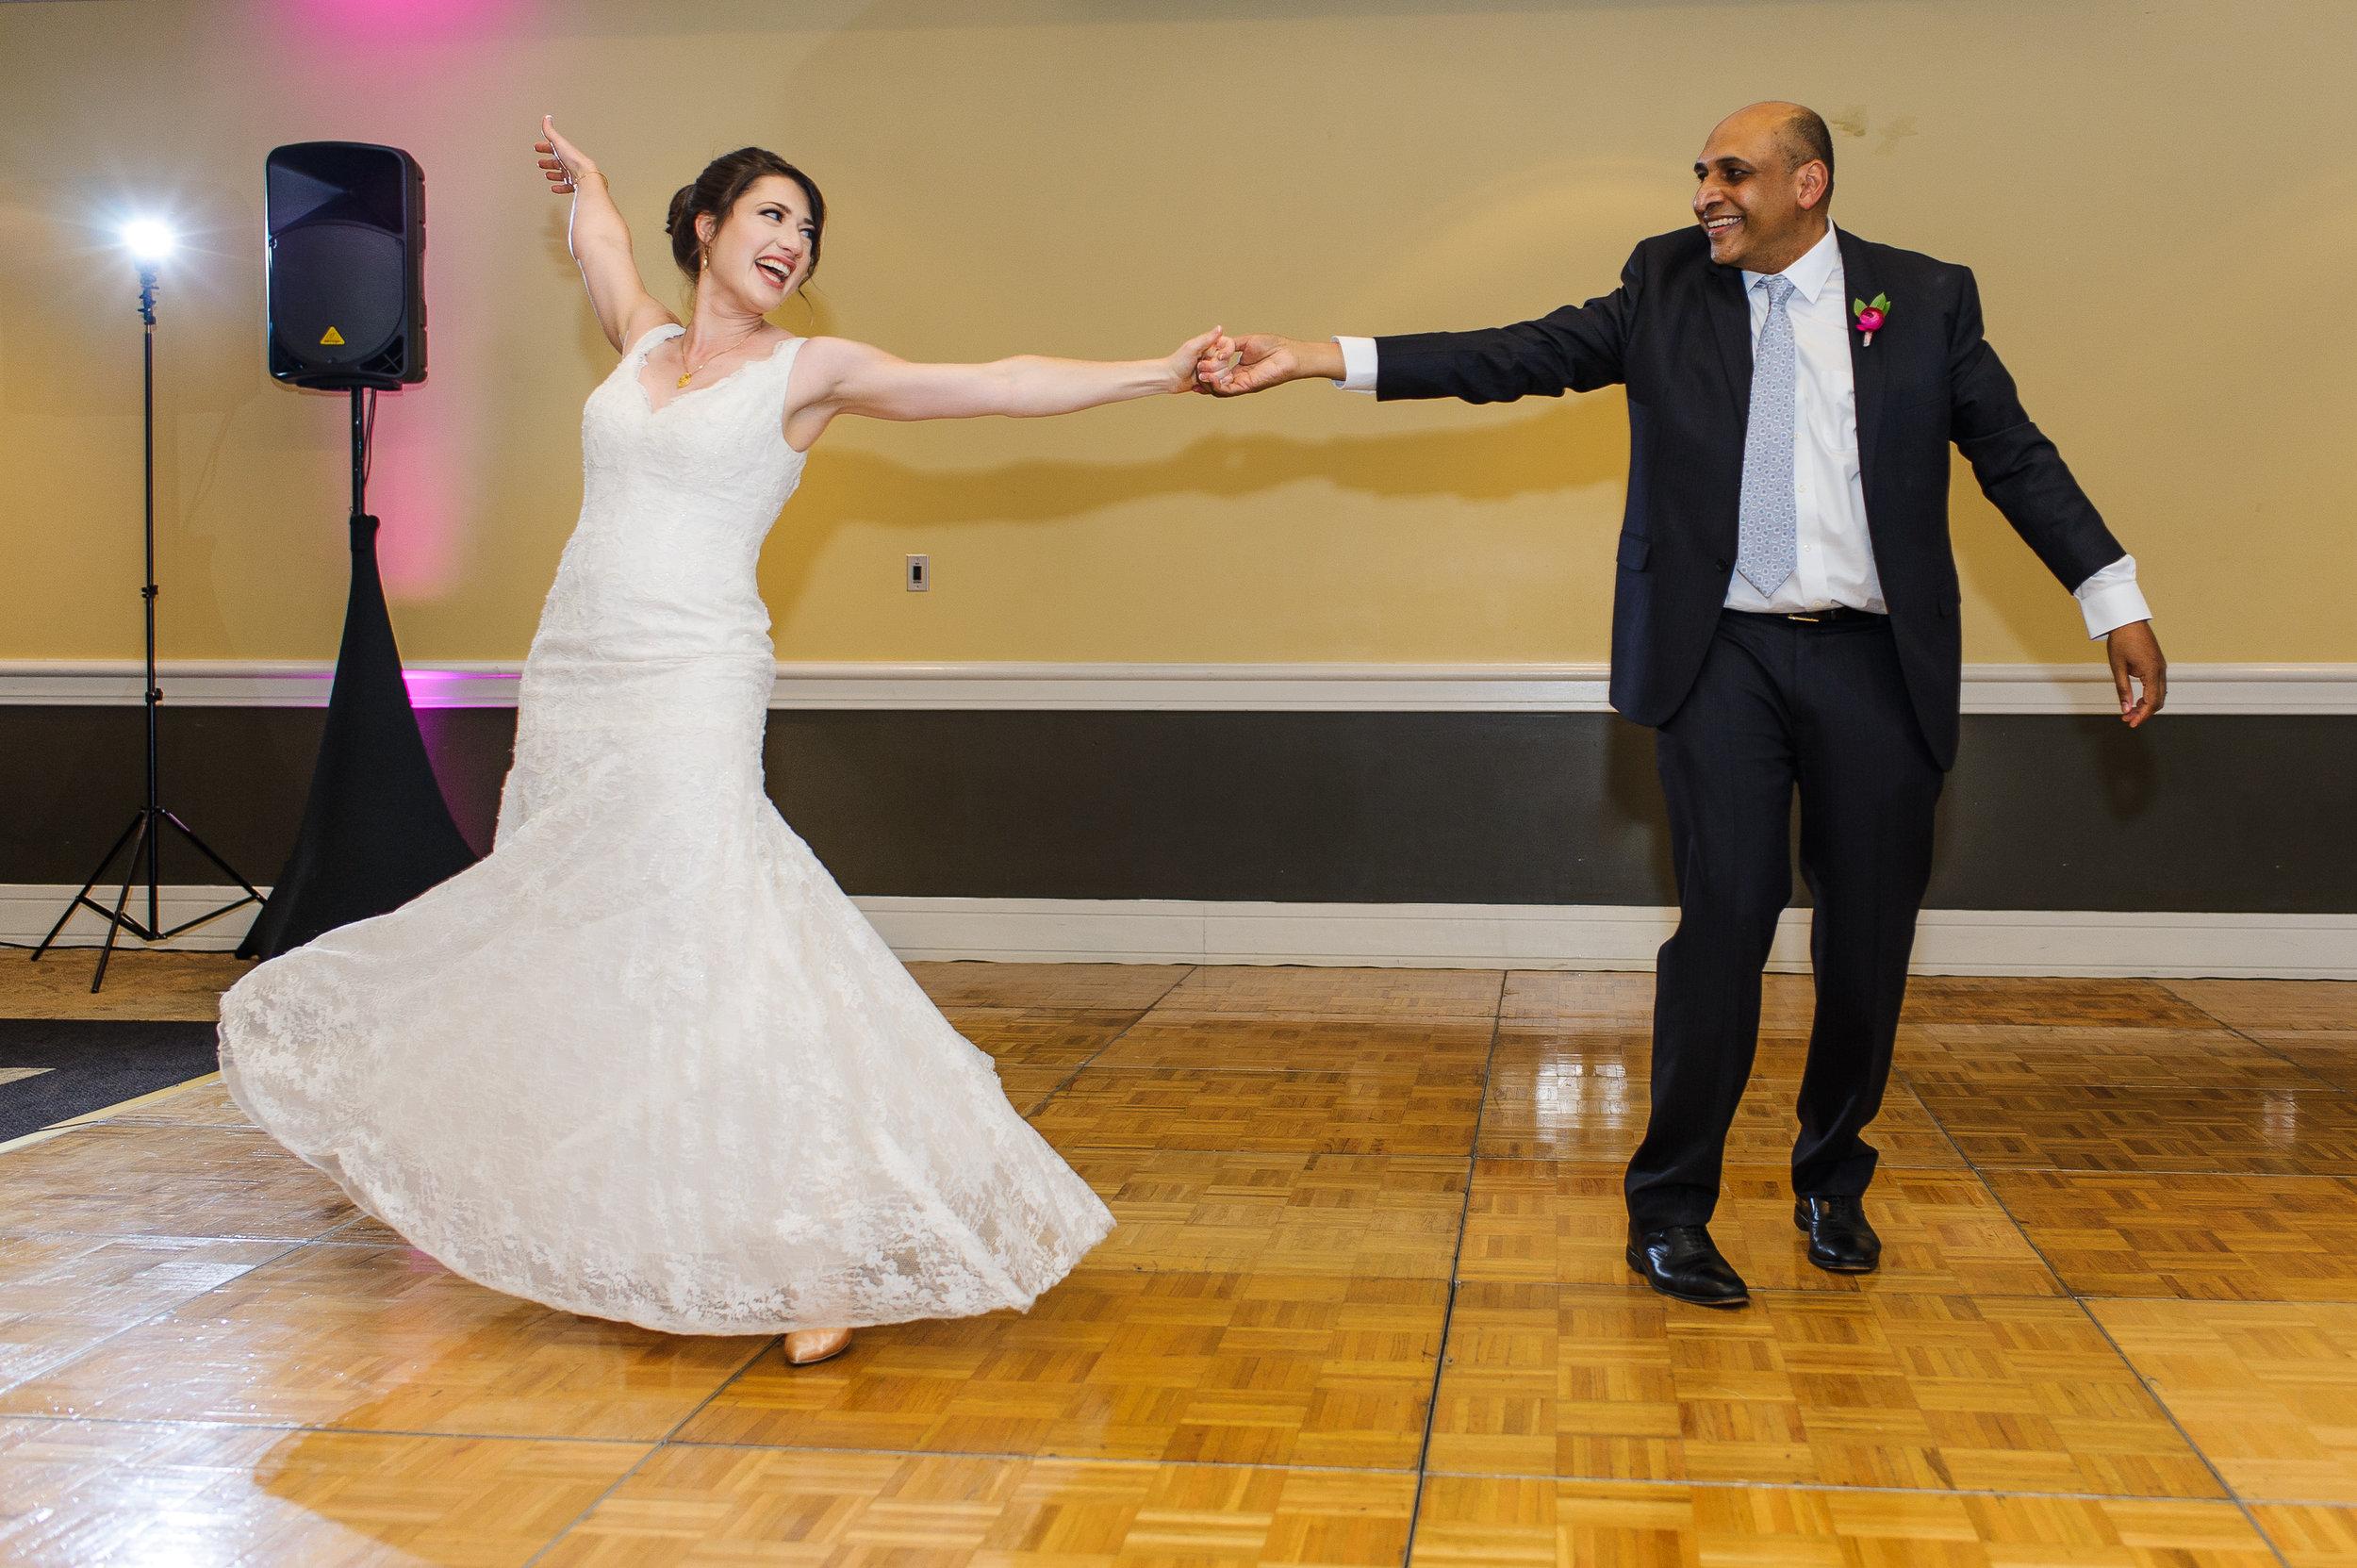 060317-emory-wedding-atlanta-swaminathan_441.jpg